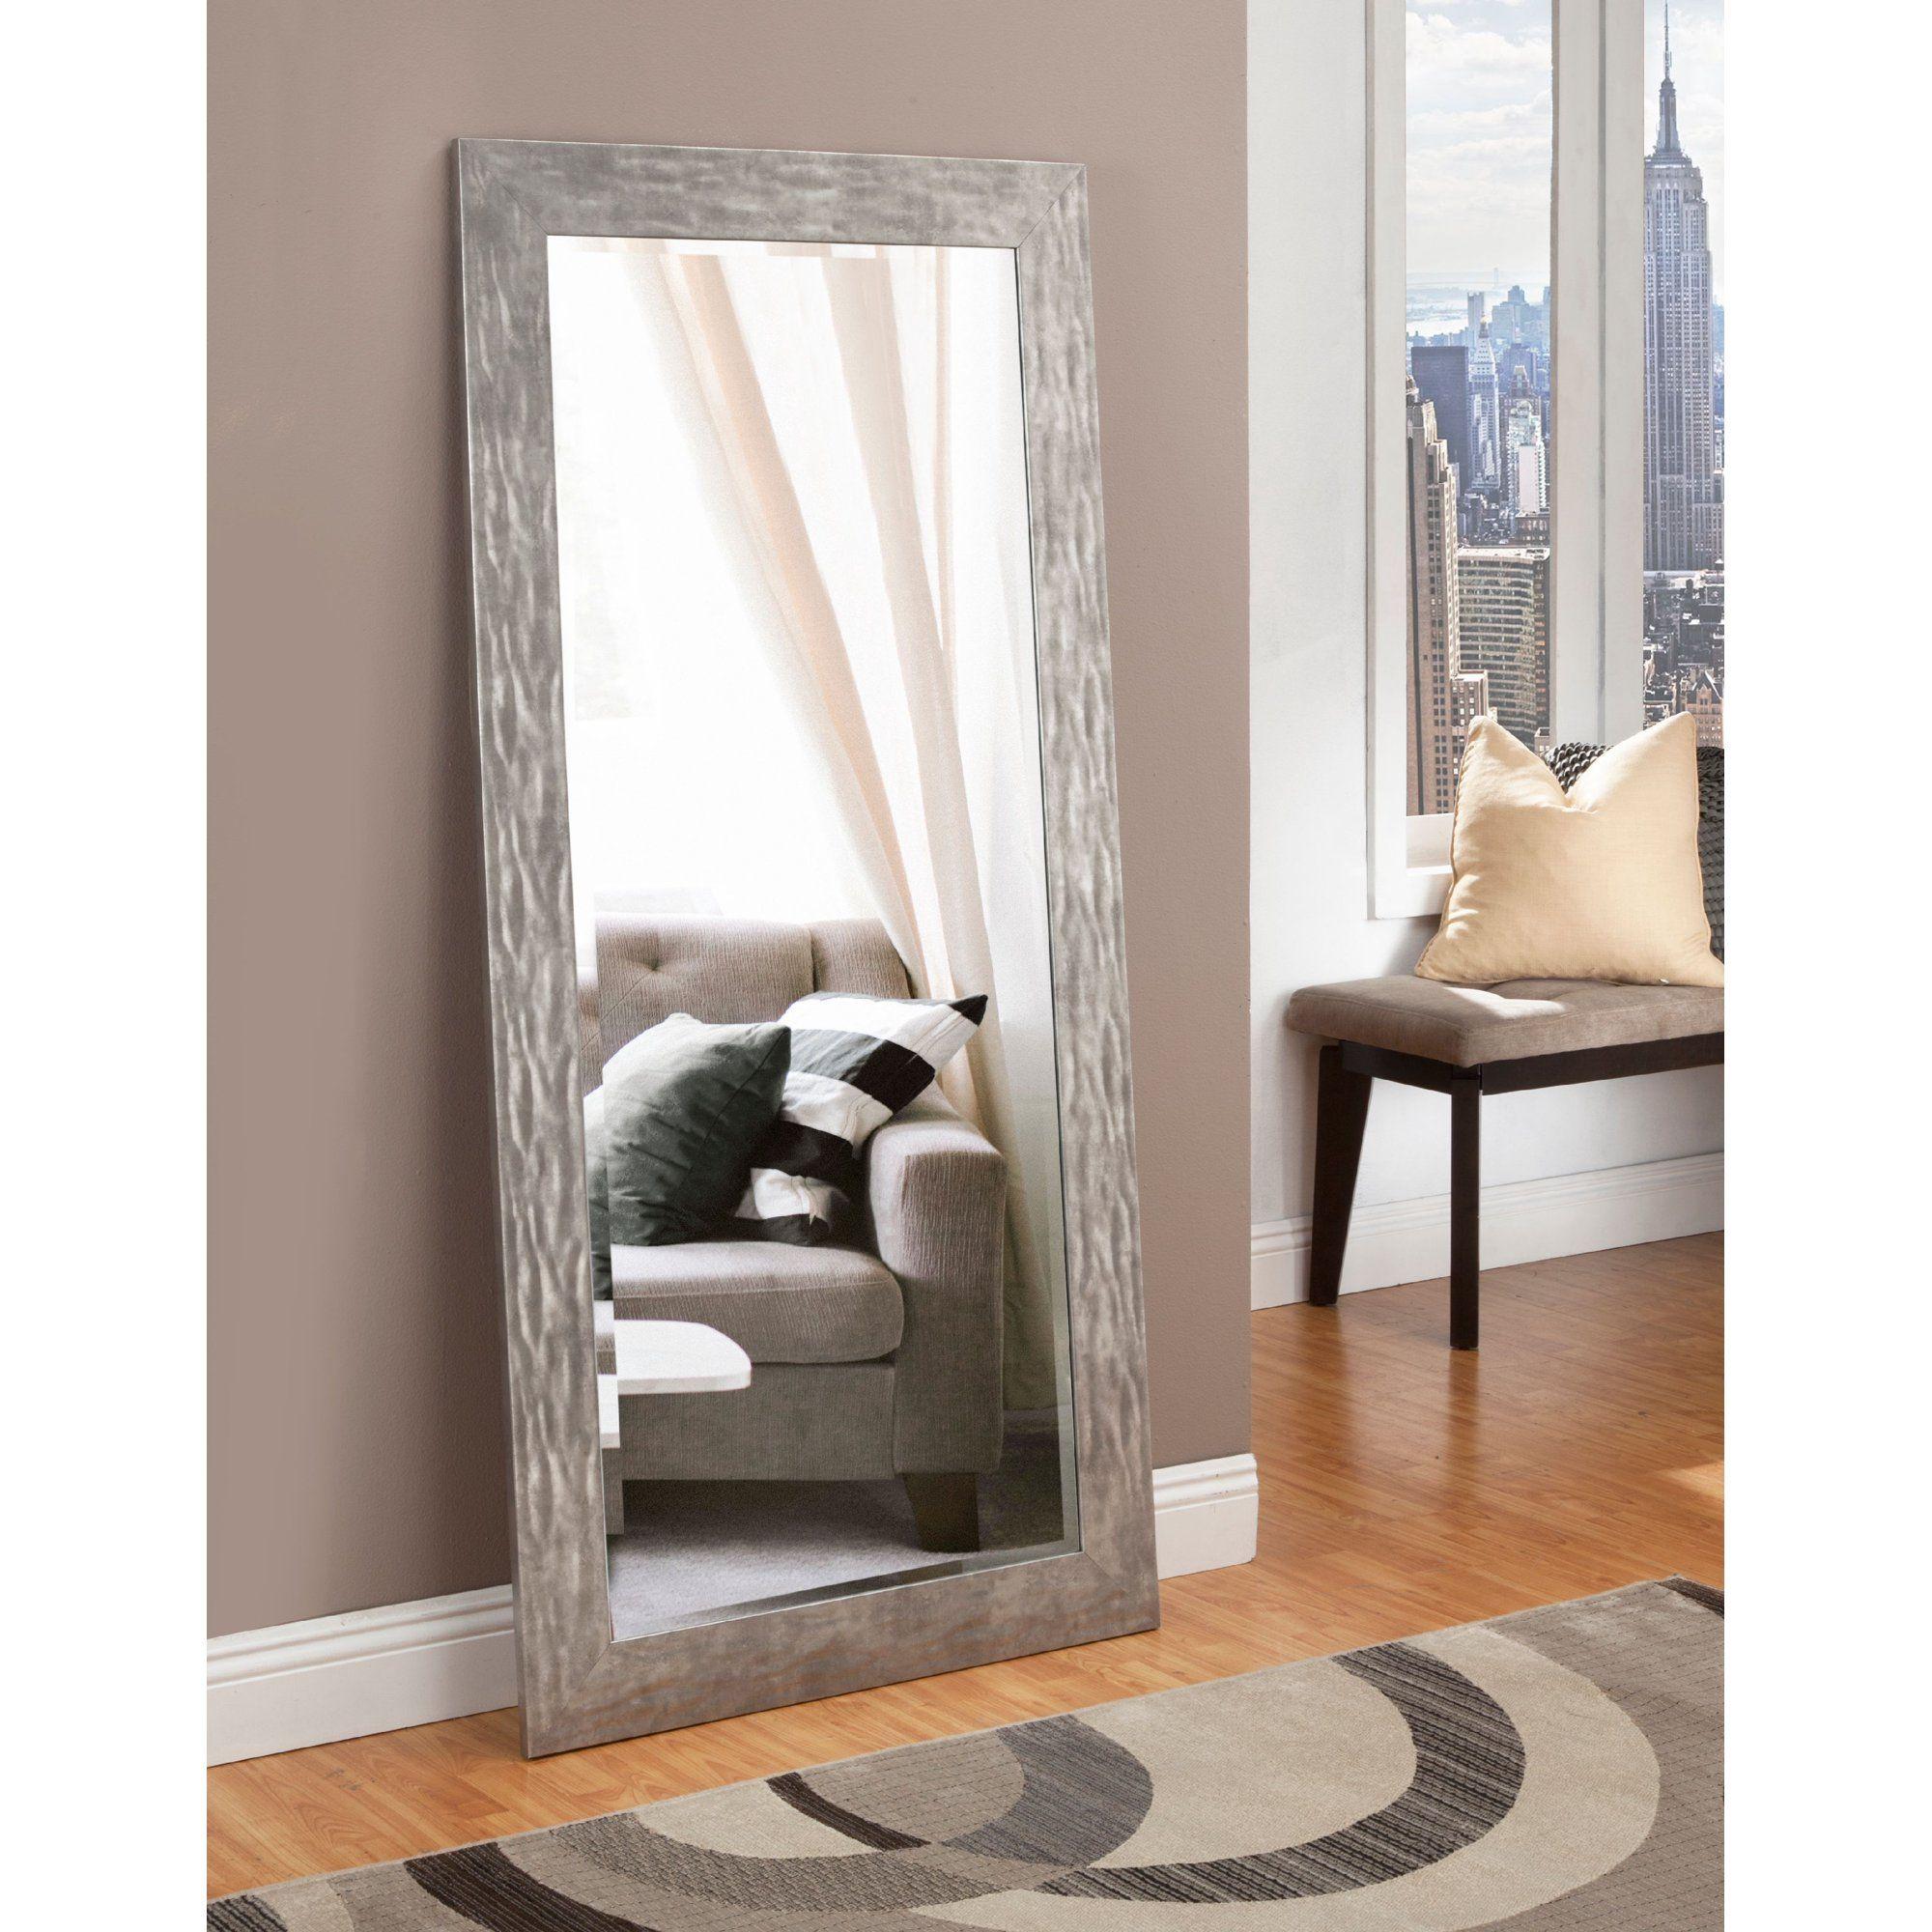 martin svensson home mirror